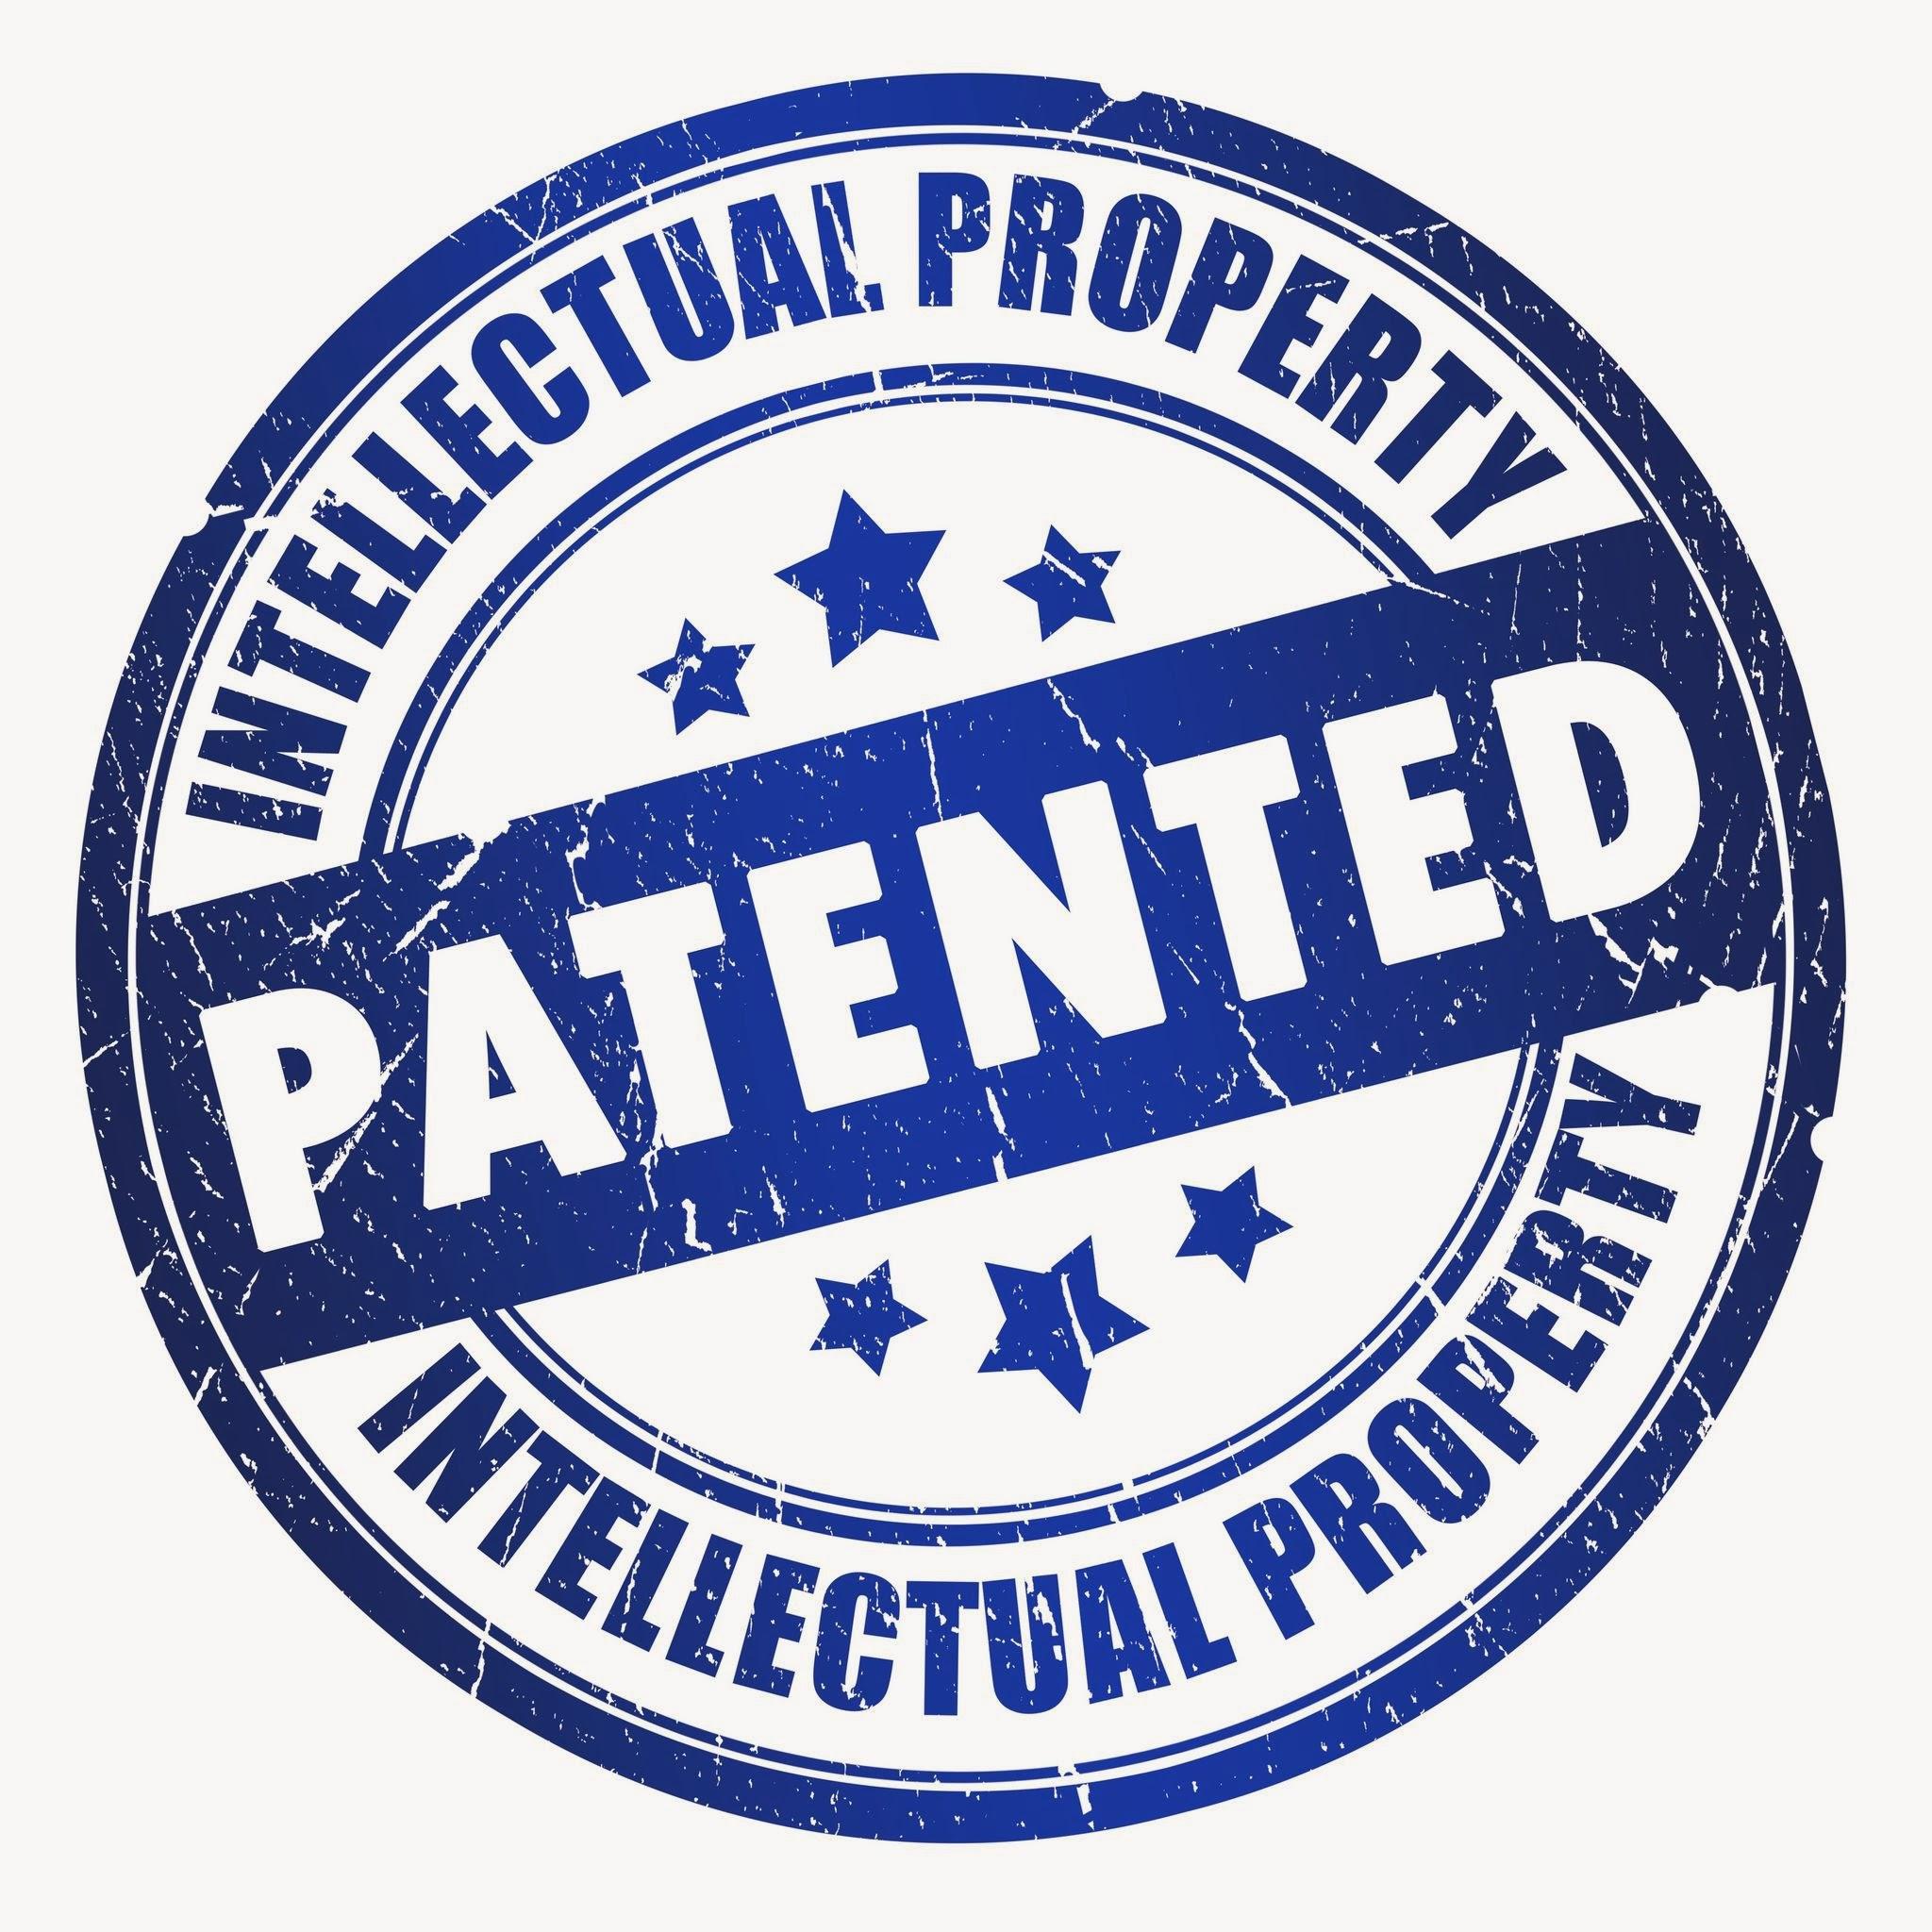 International Institute of Intellectual Property (IIIP)